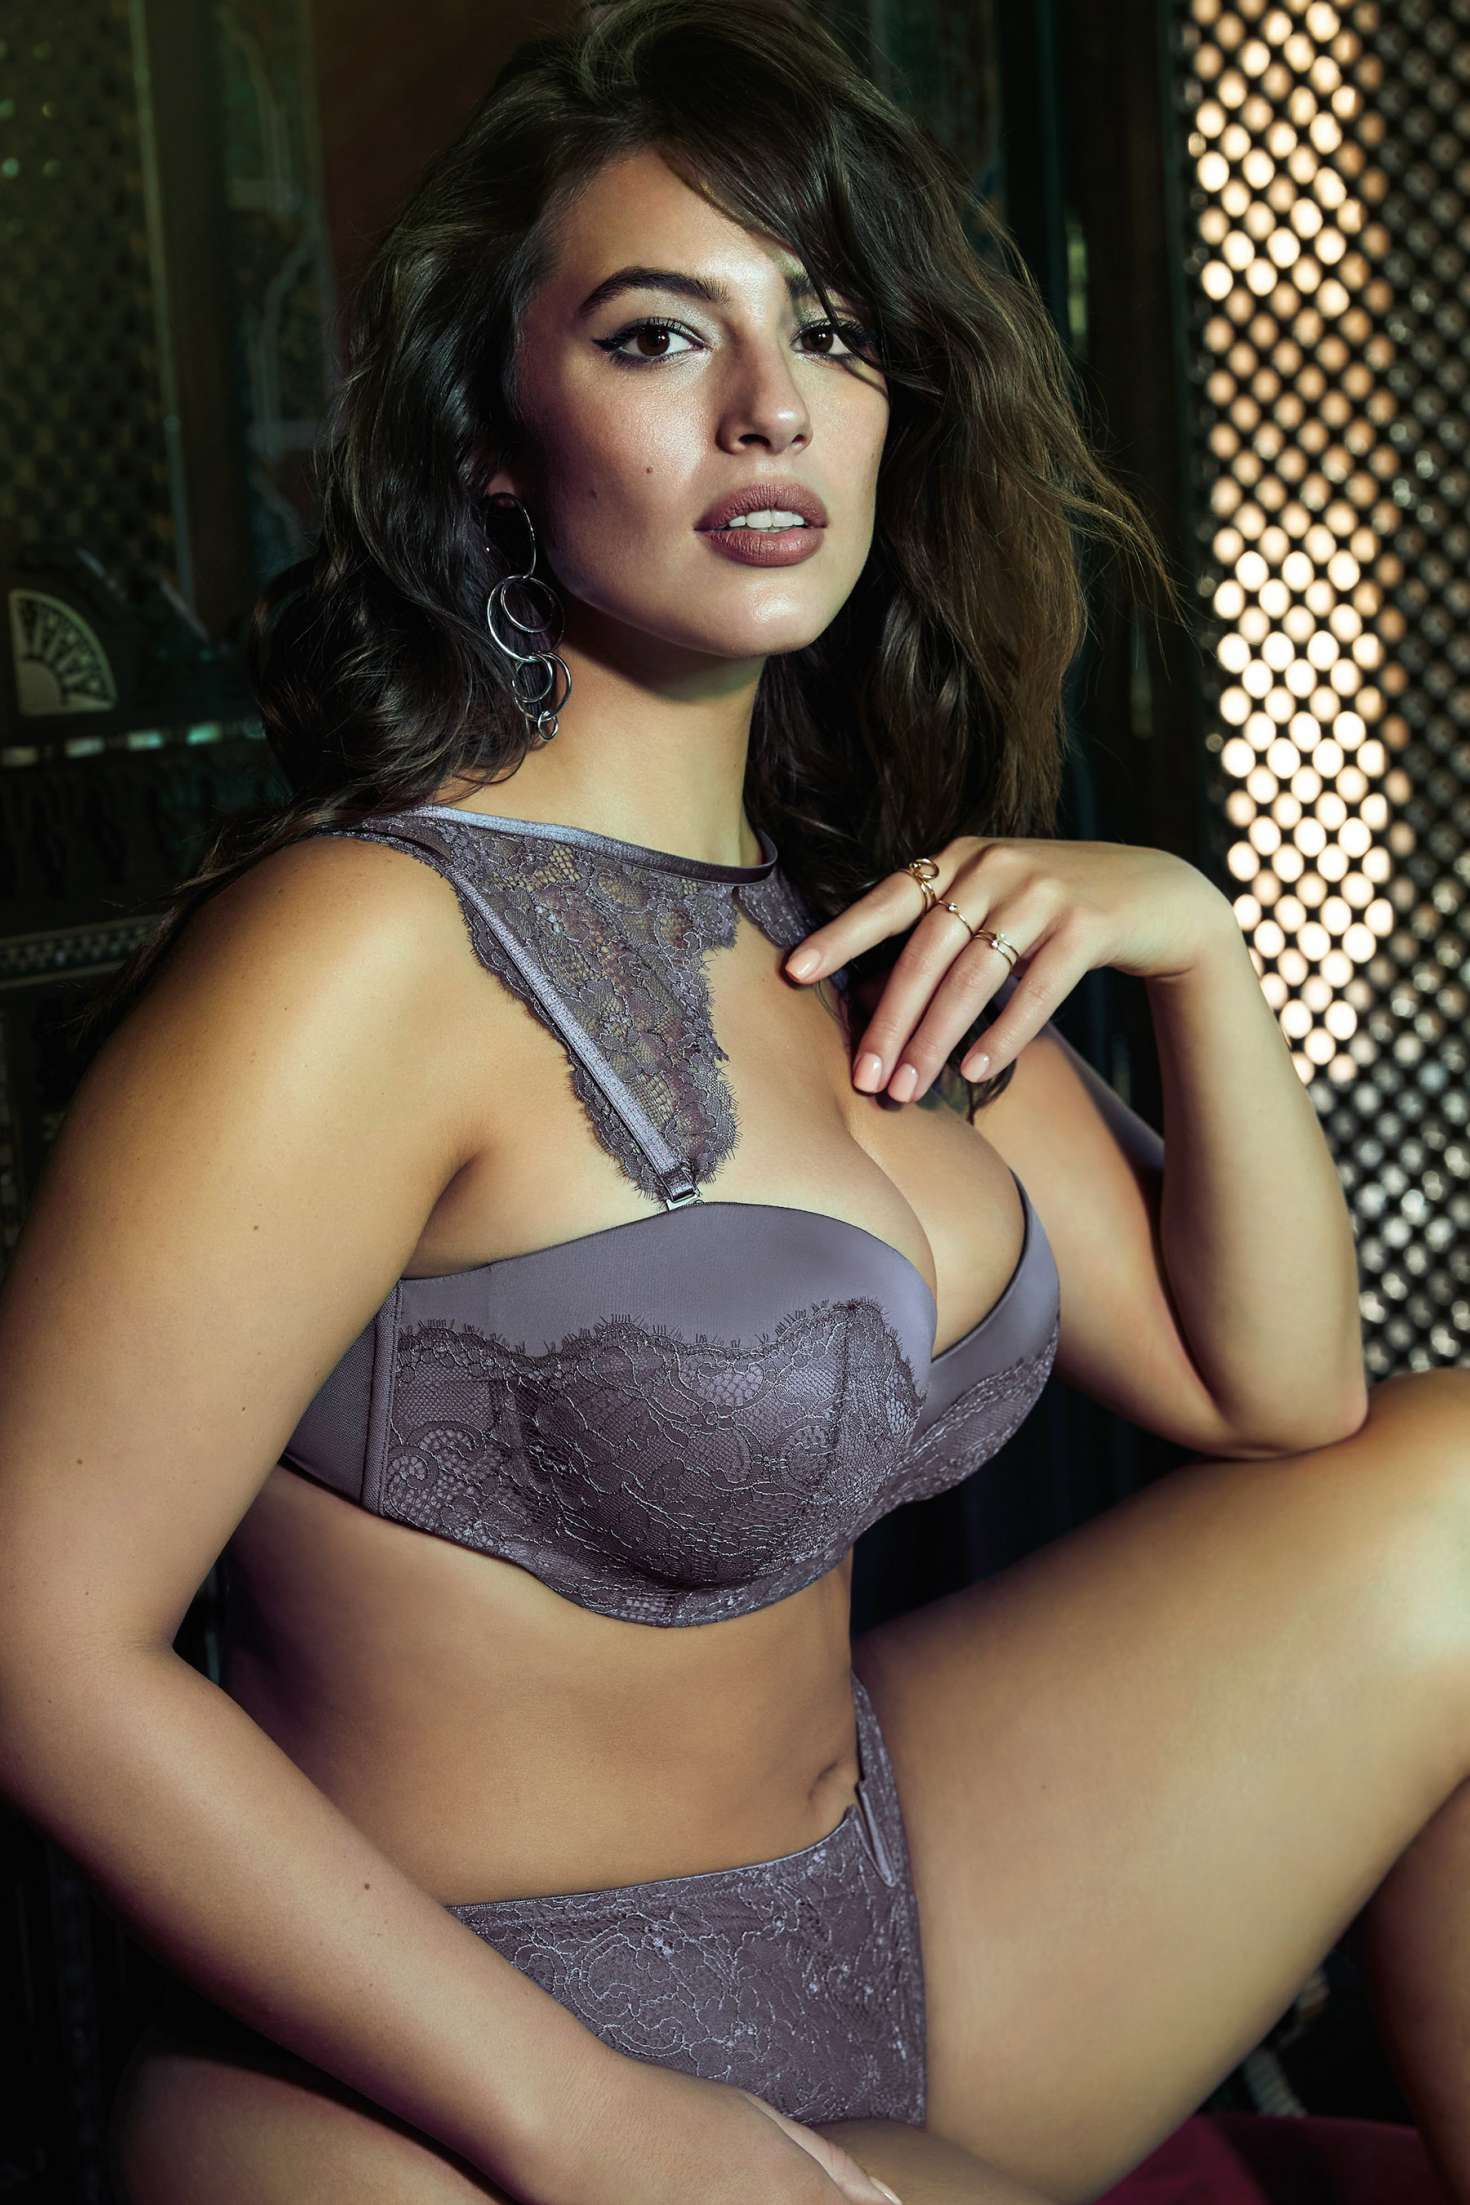 Pictures Alicia Keys nude photos 2019